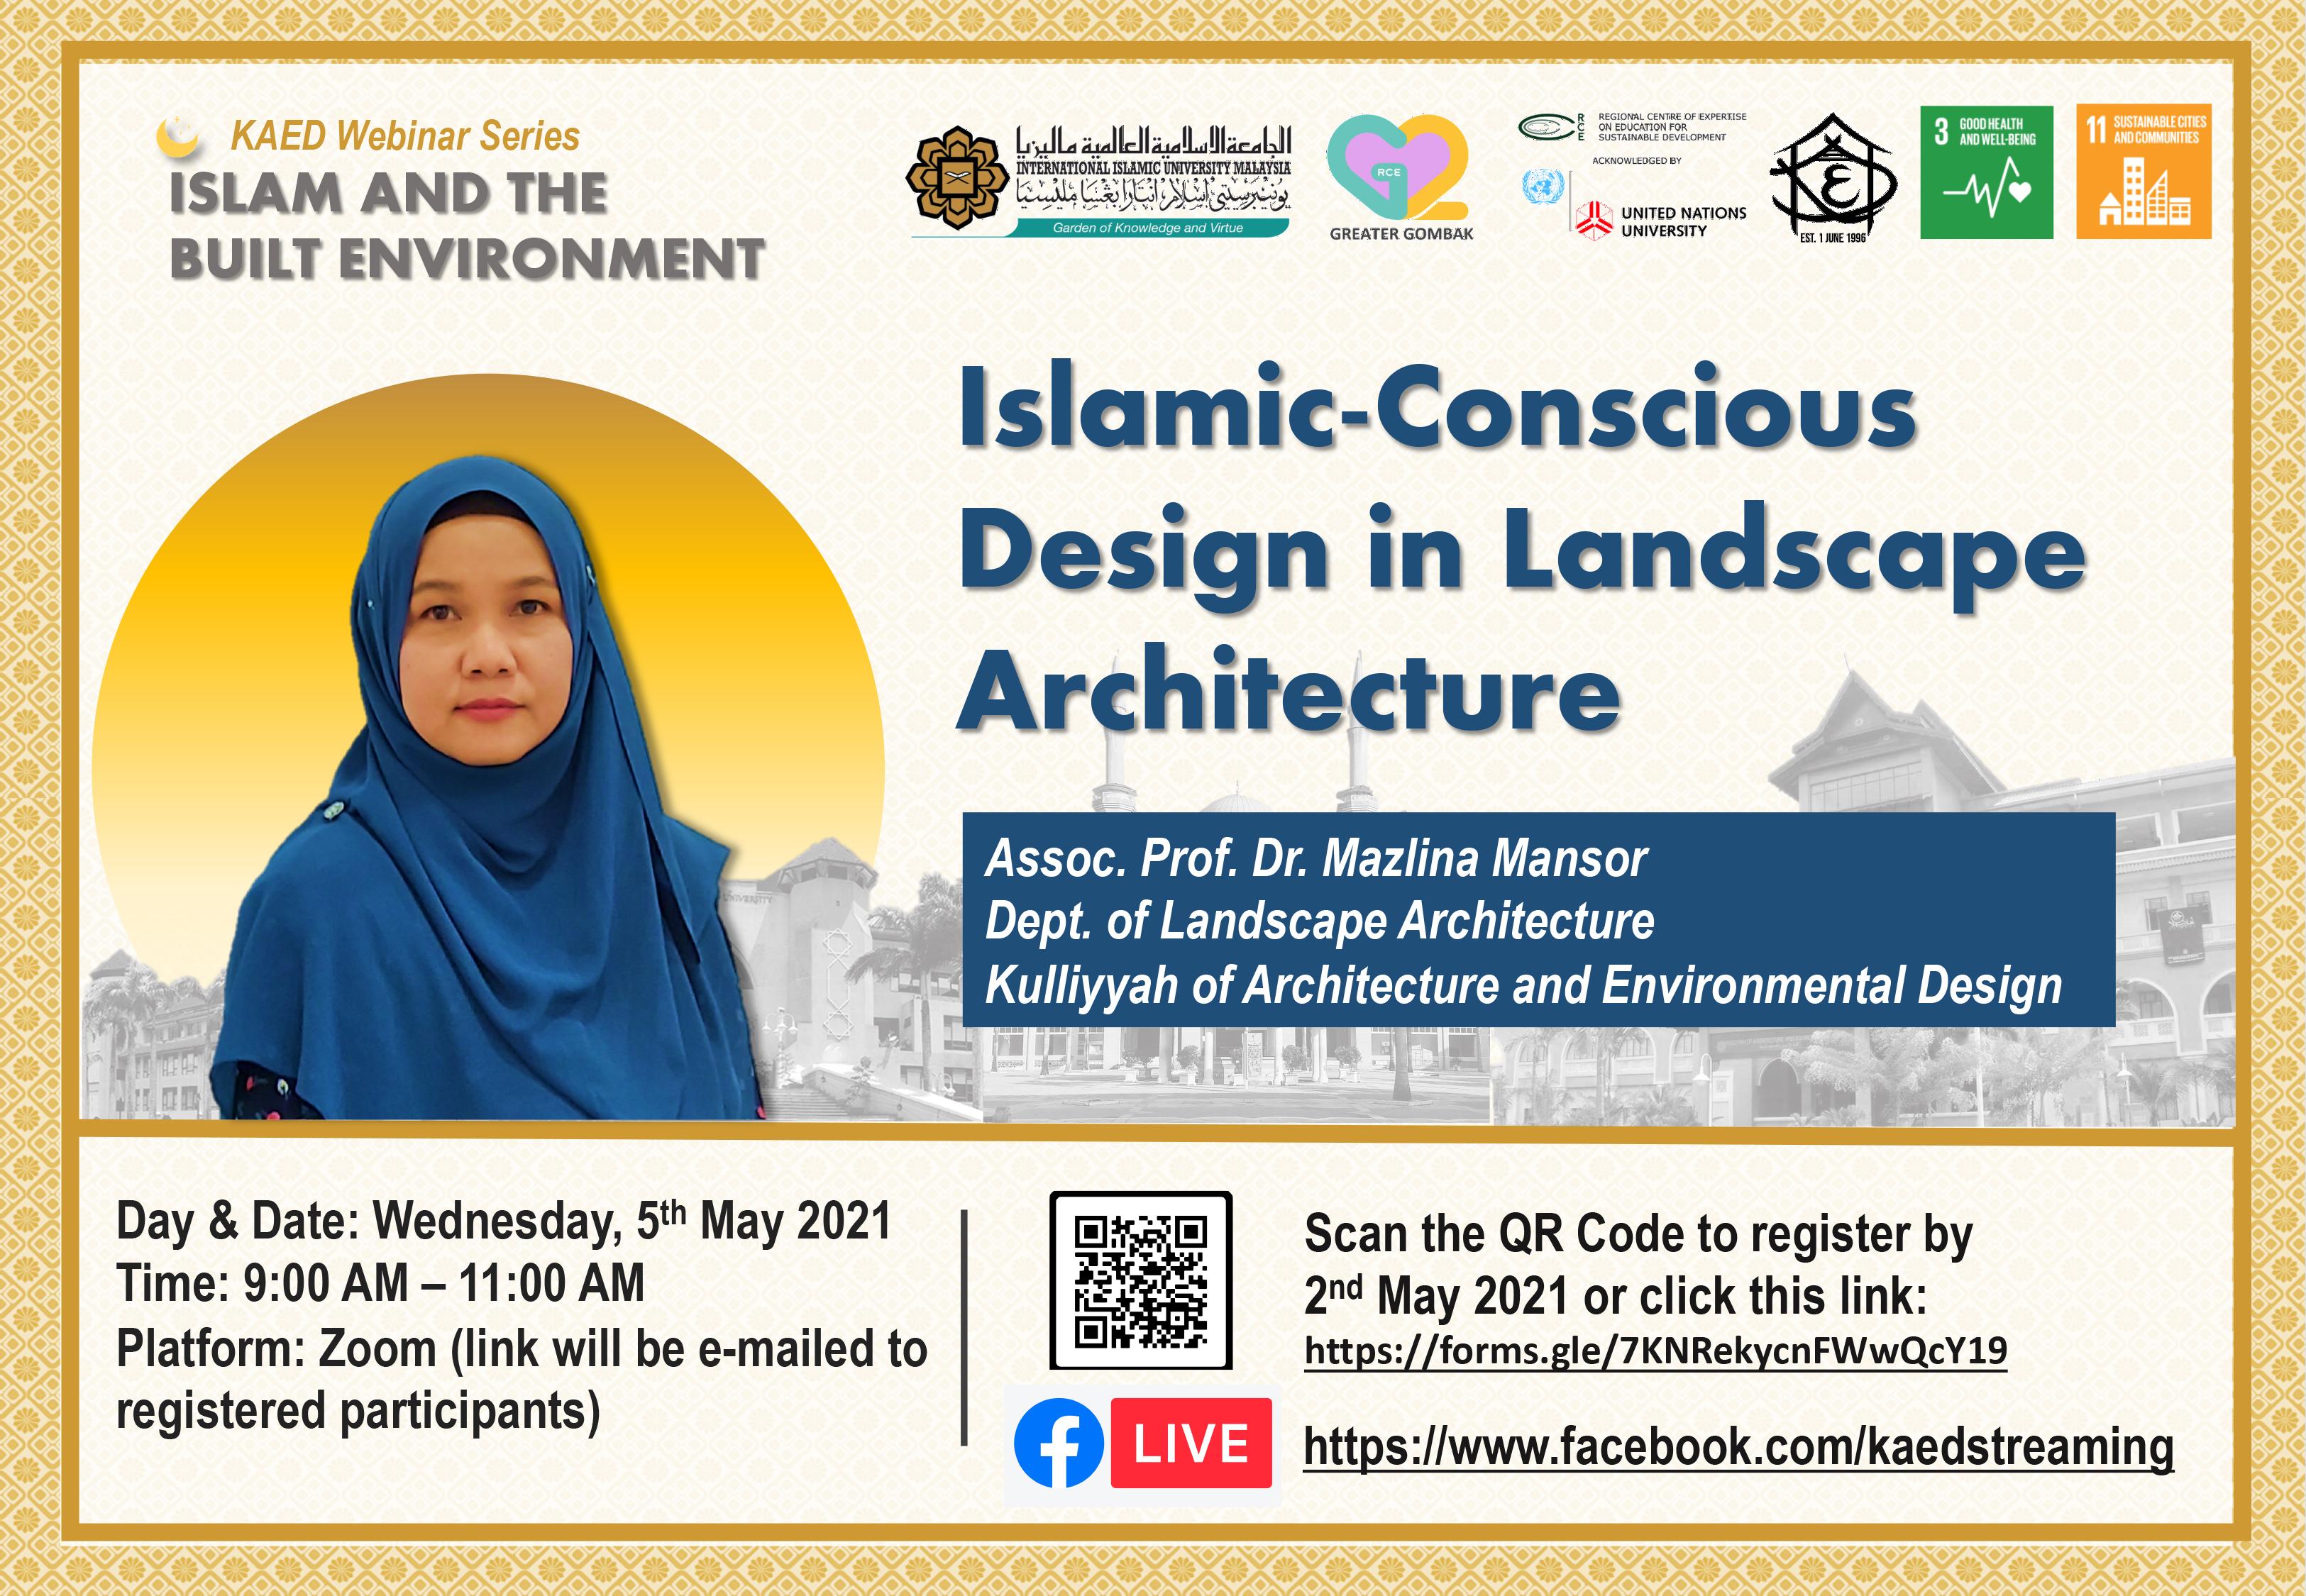 Islamic-Conscious Design in Landscape Architecture Webinar